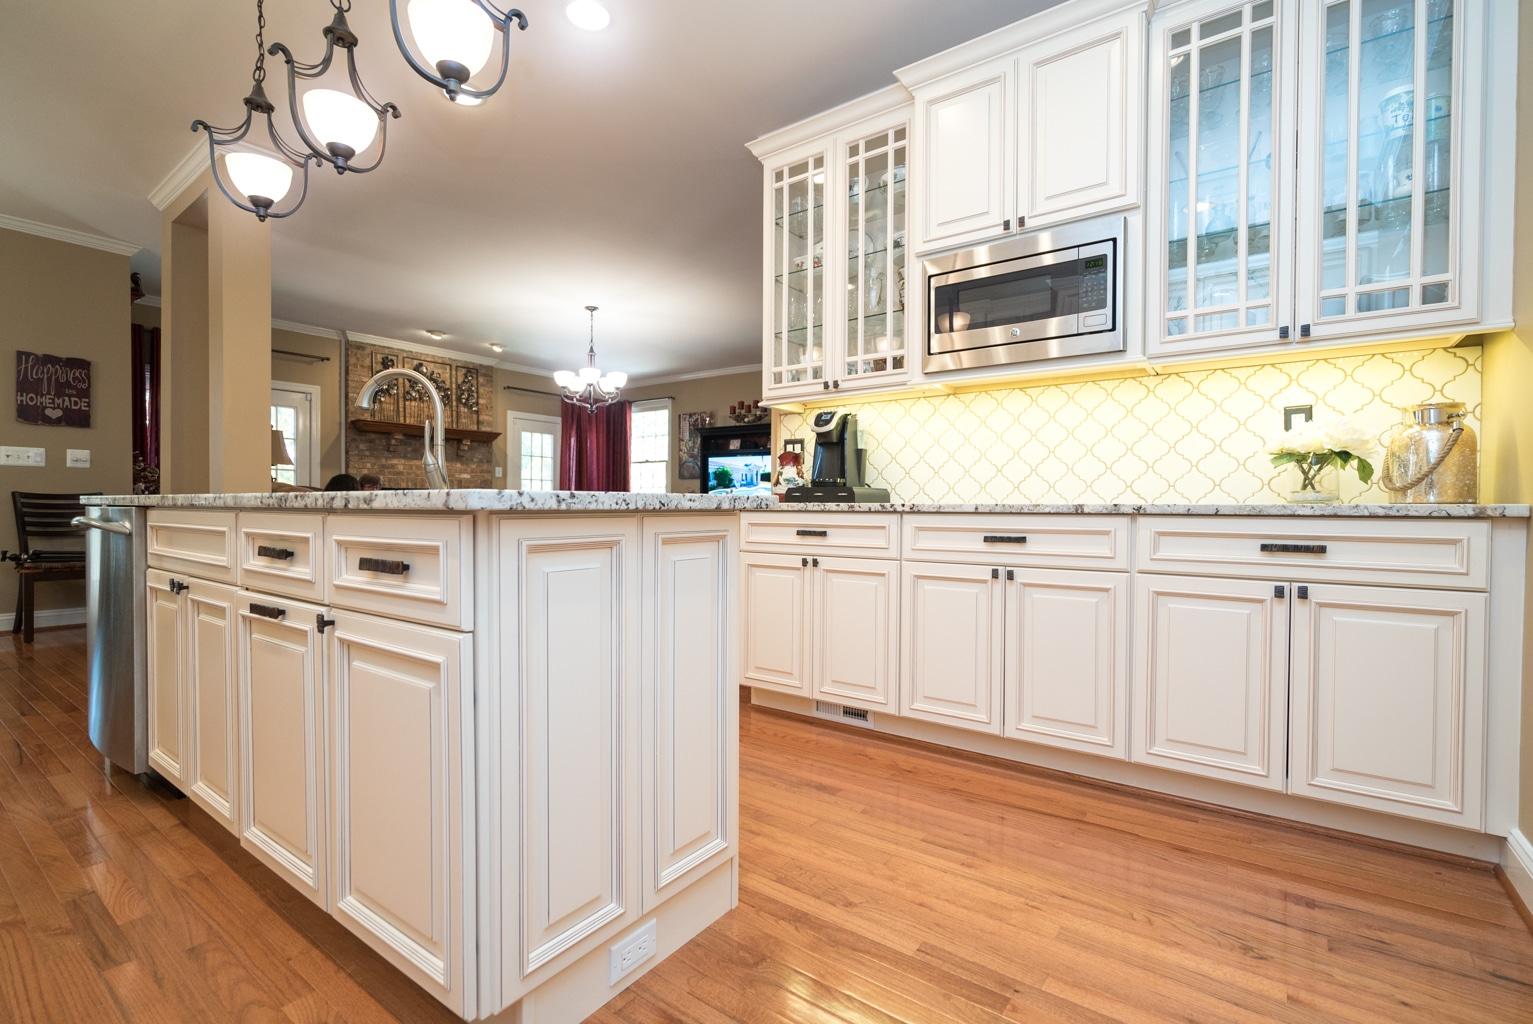 Kitchen Cabinets in Leesburg VA Kitchen Cabinets